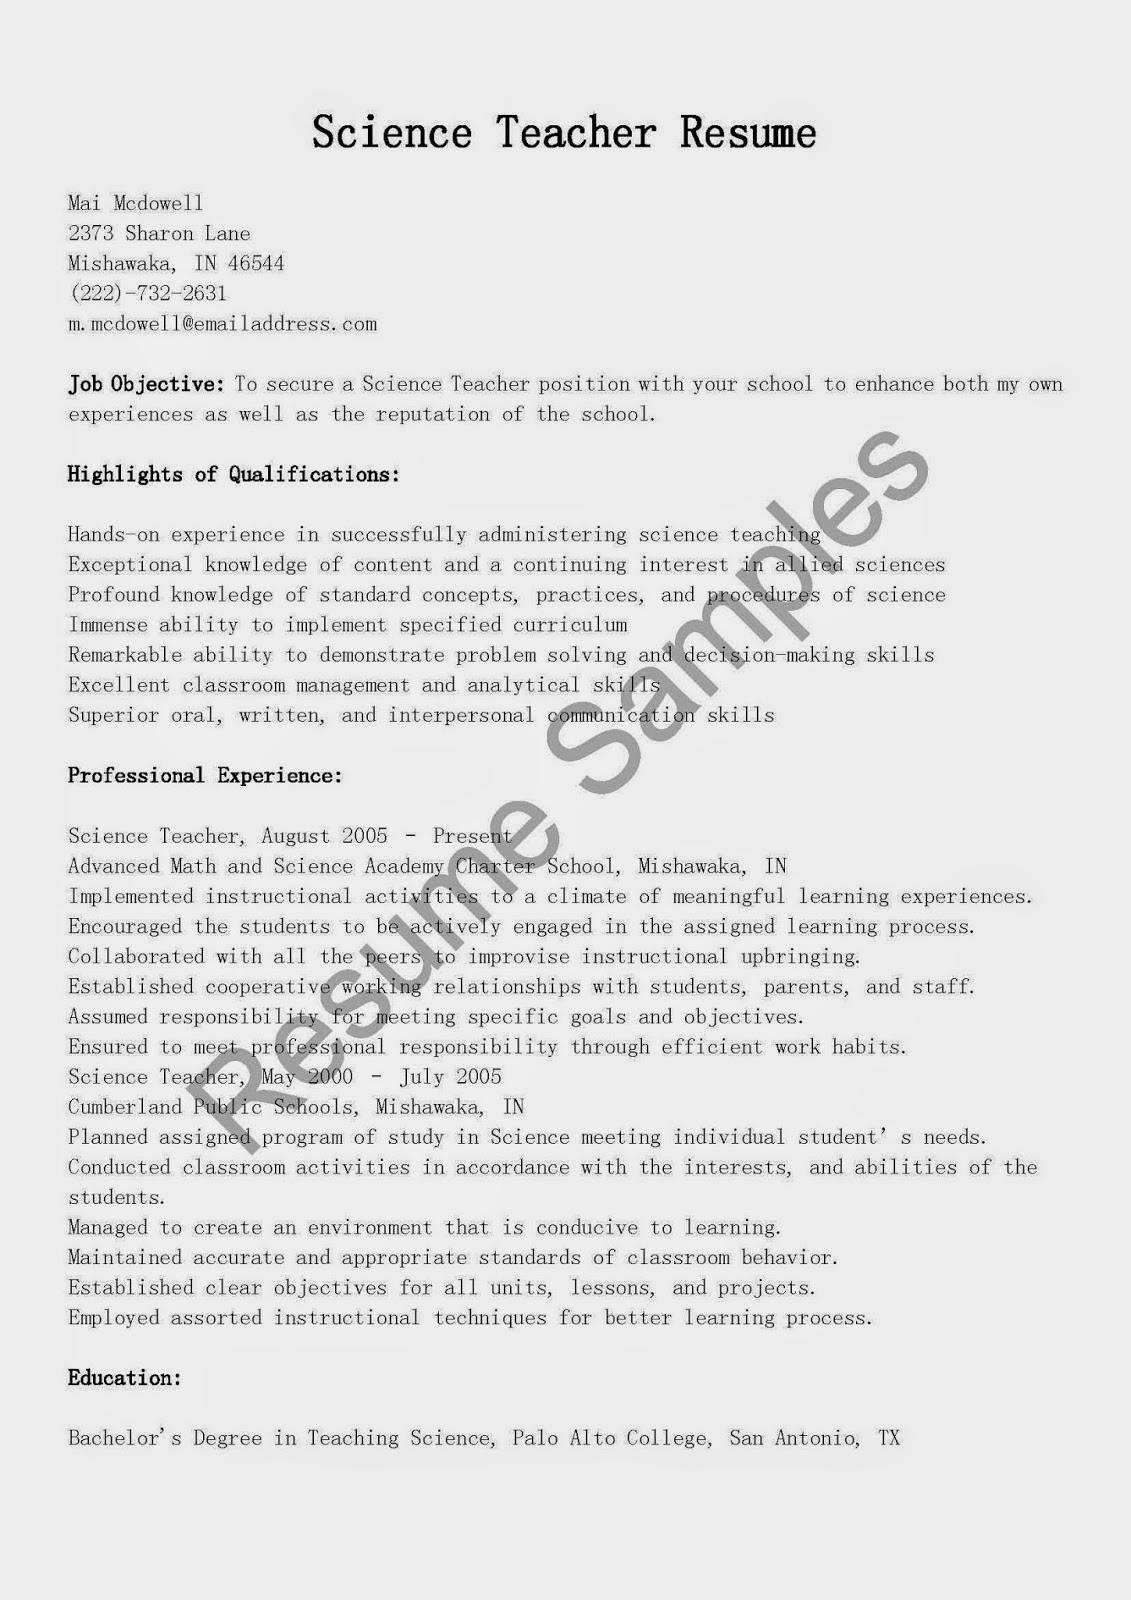 resume samples  science teacher resume sample